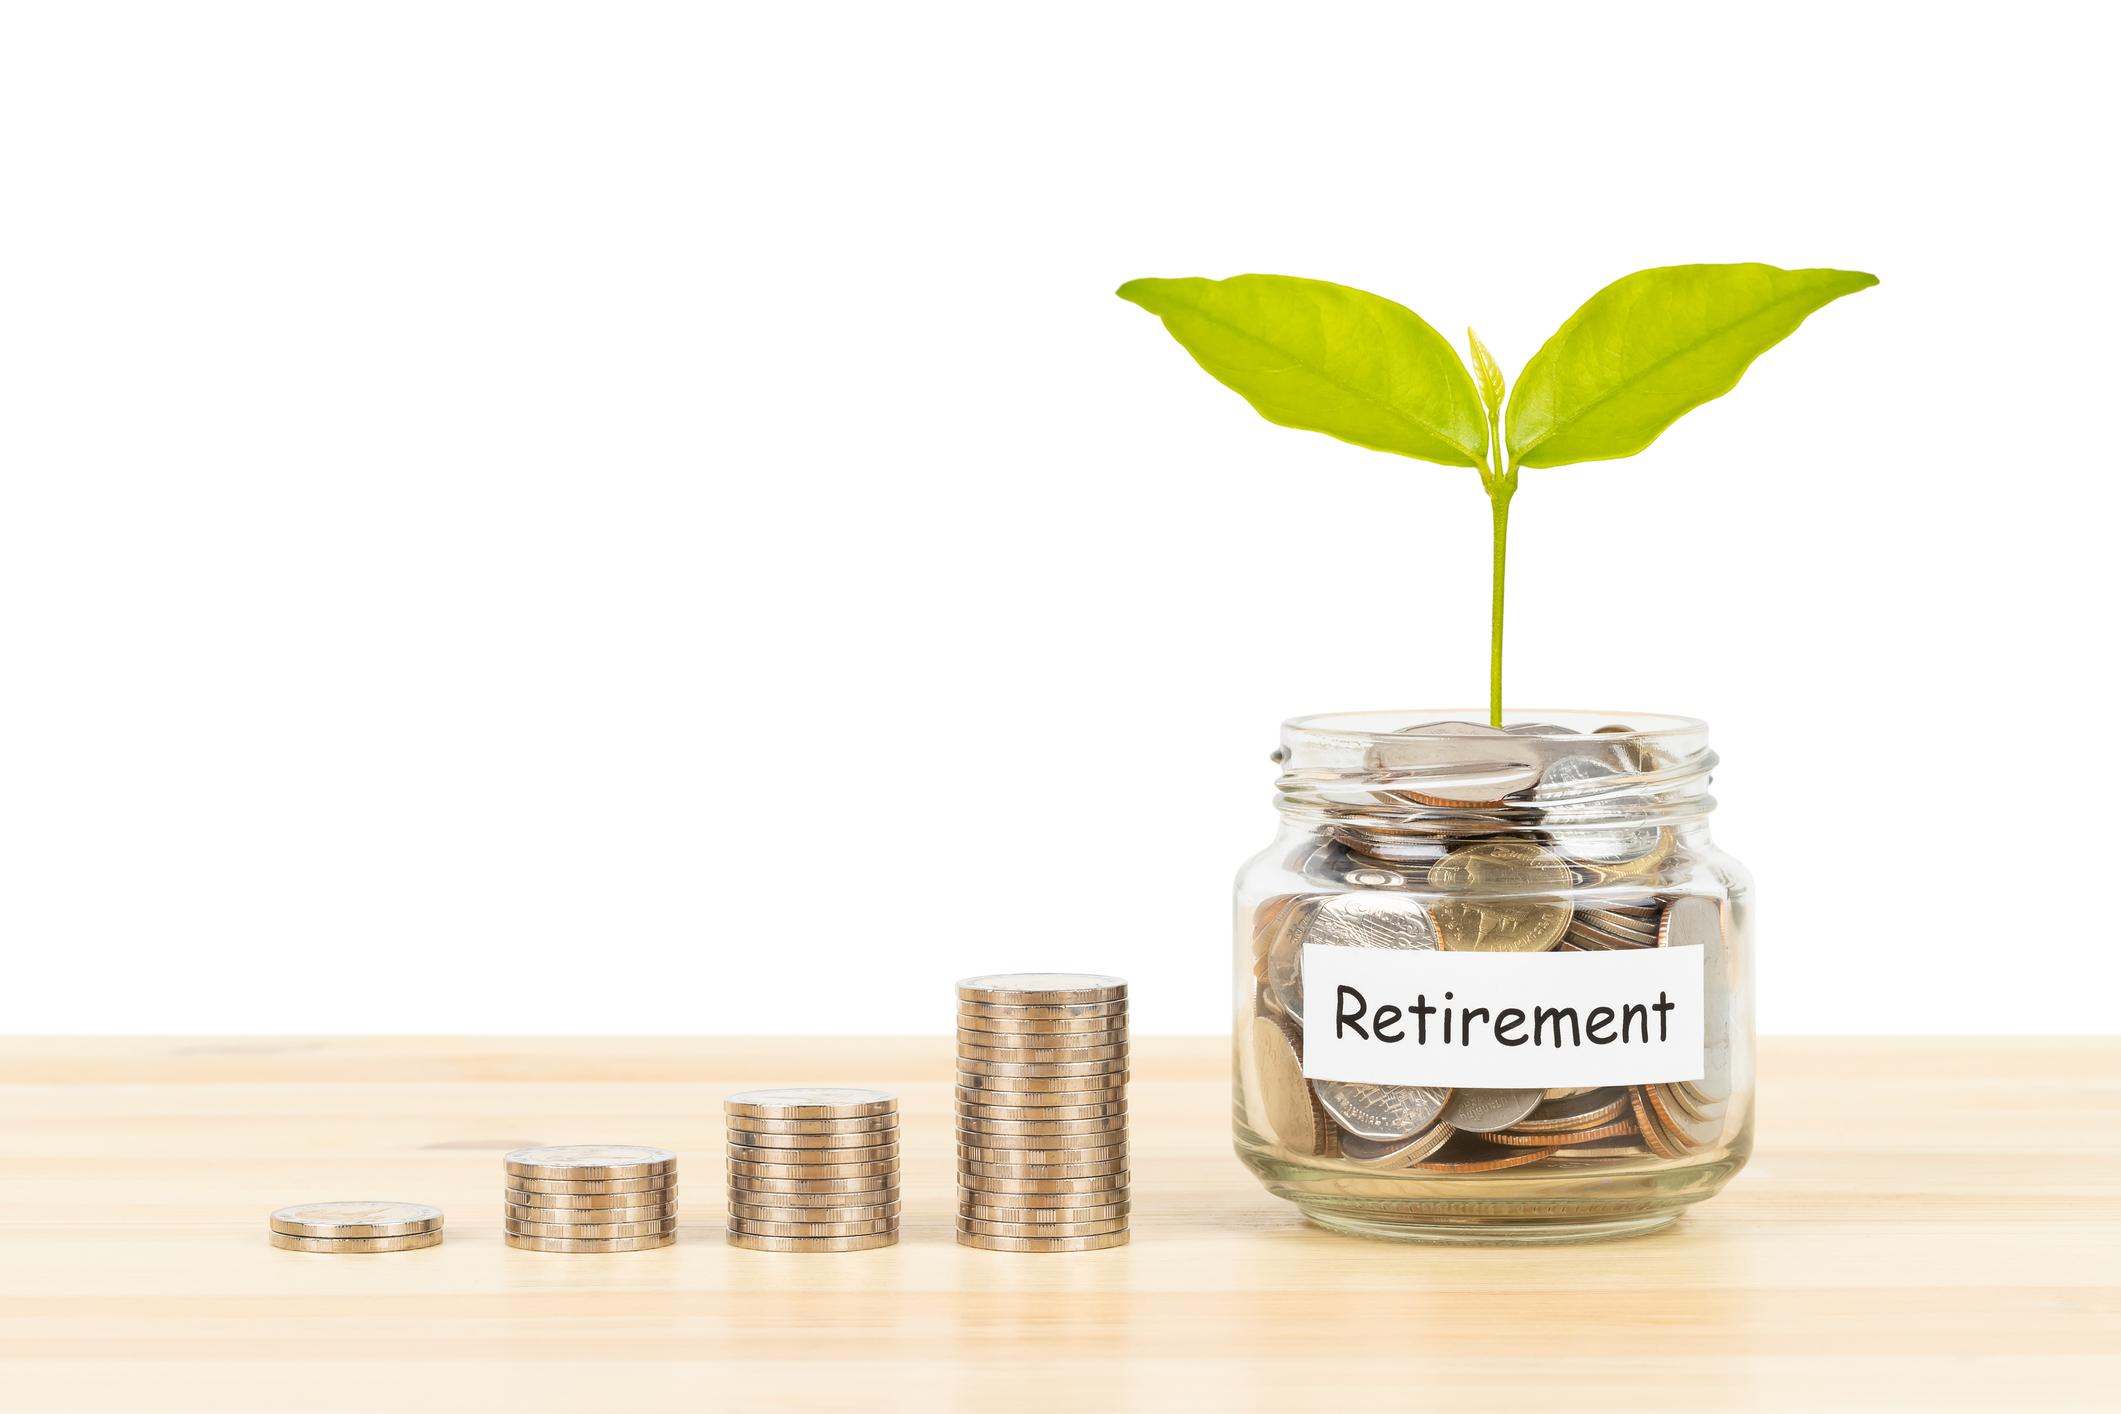 2 Stocks to Bankroll Your Retirement